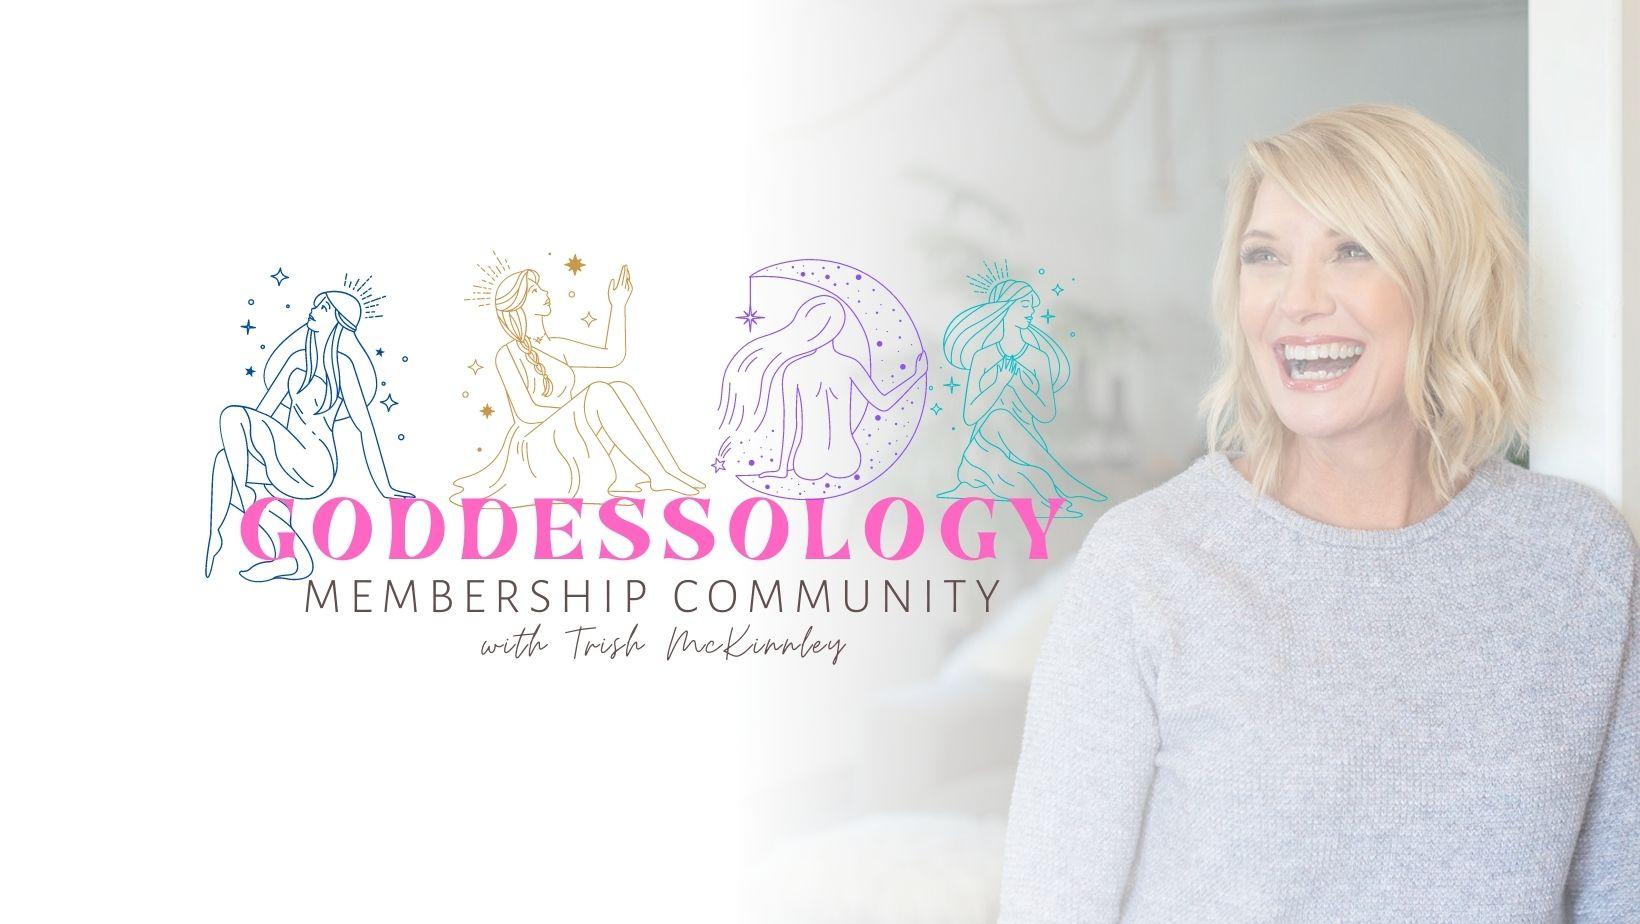 Goodessology Membership FB Cover